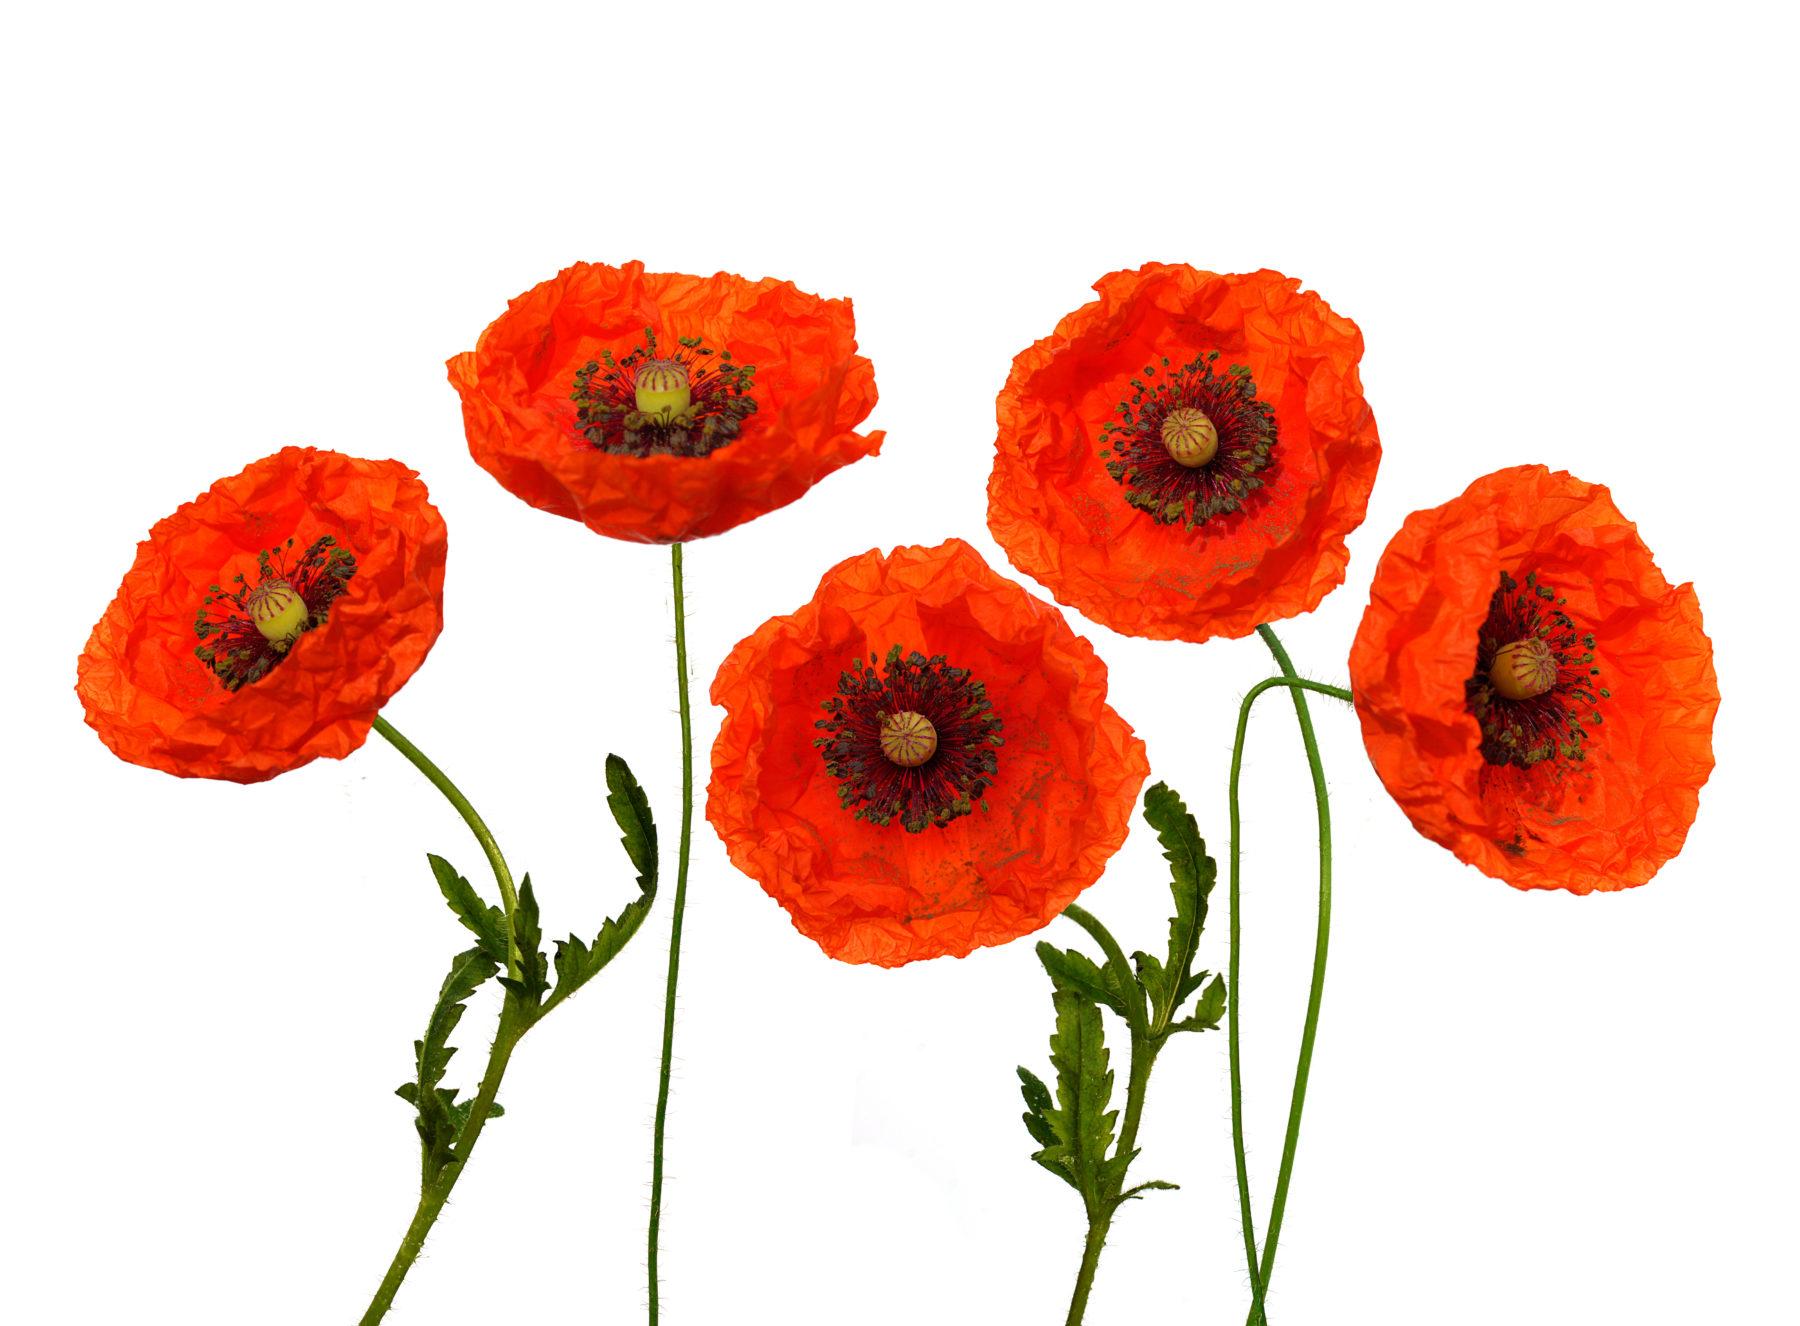 Blumen Klatschmohn Shutterstock 88385374